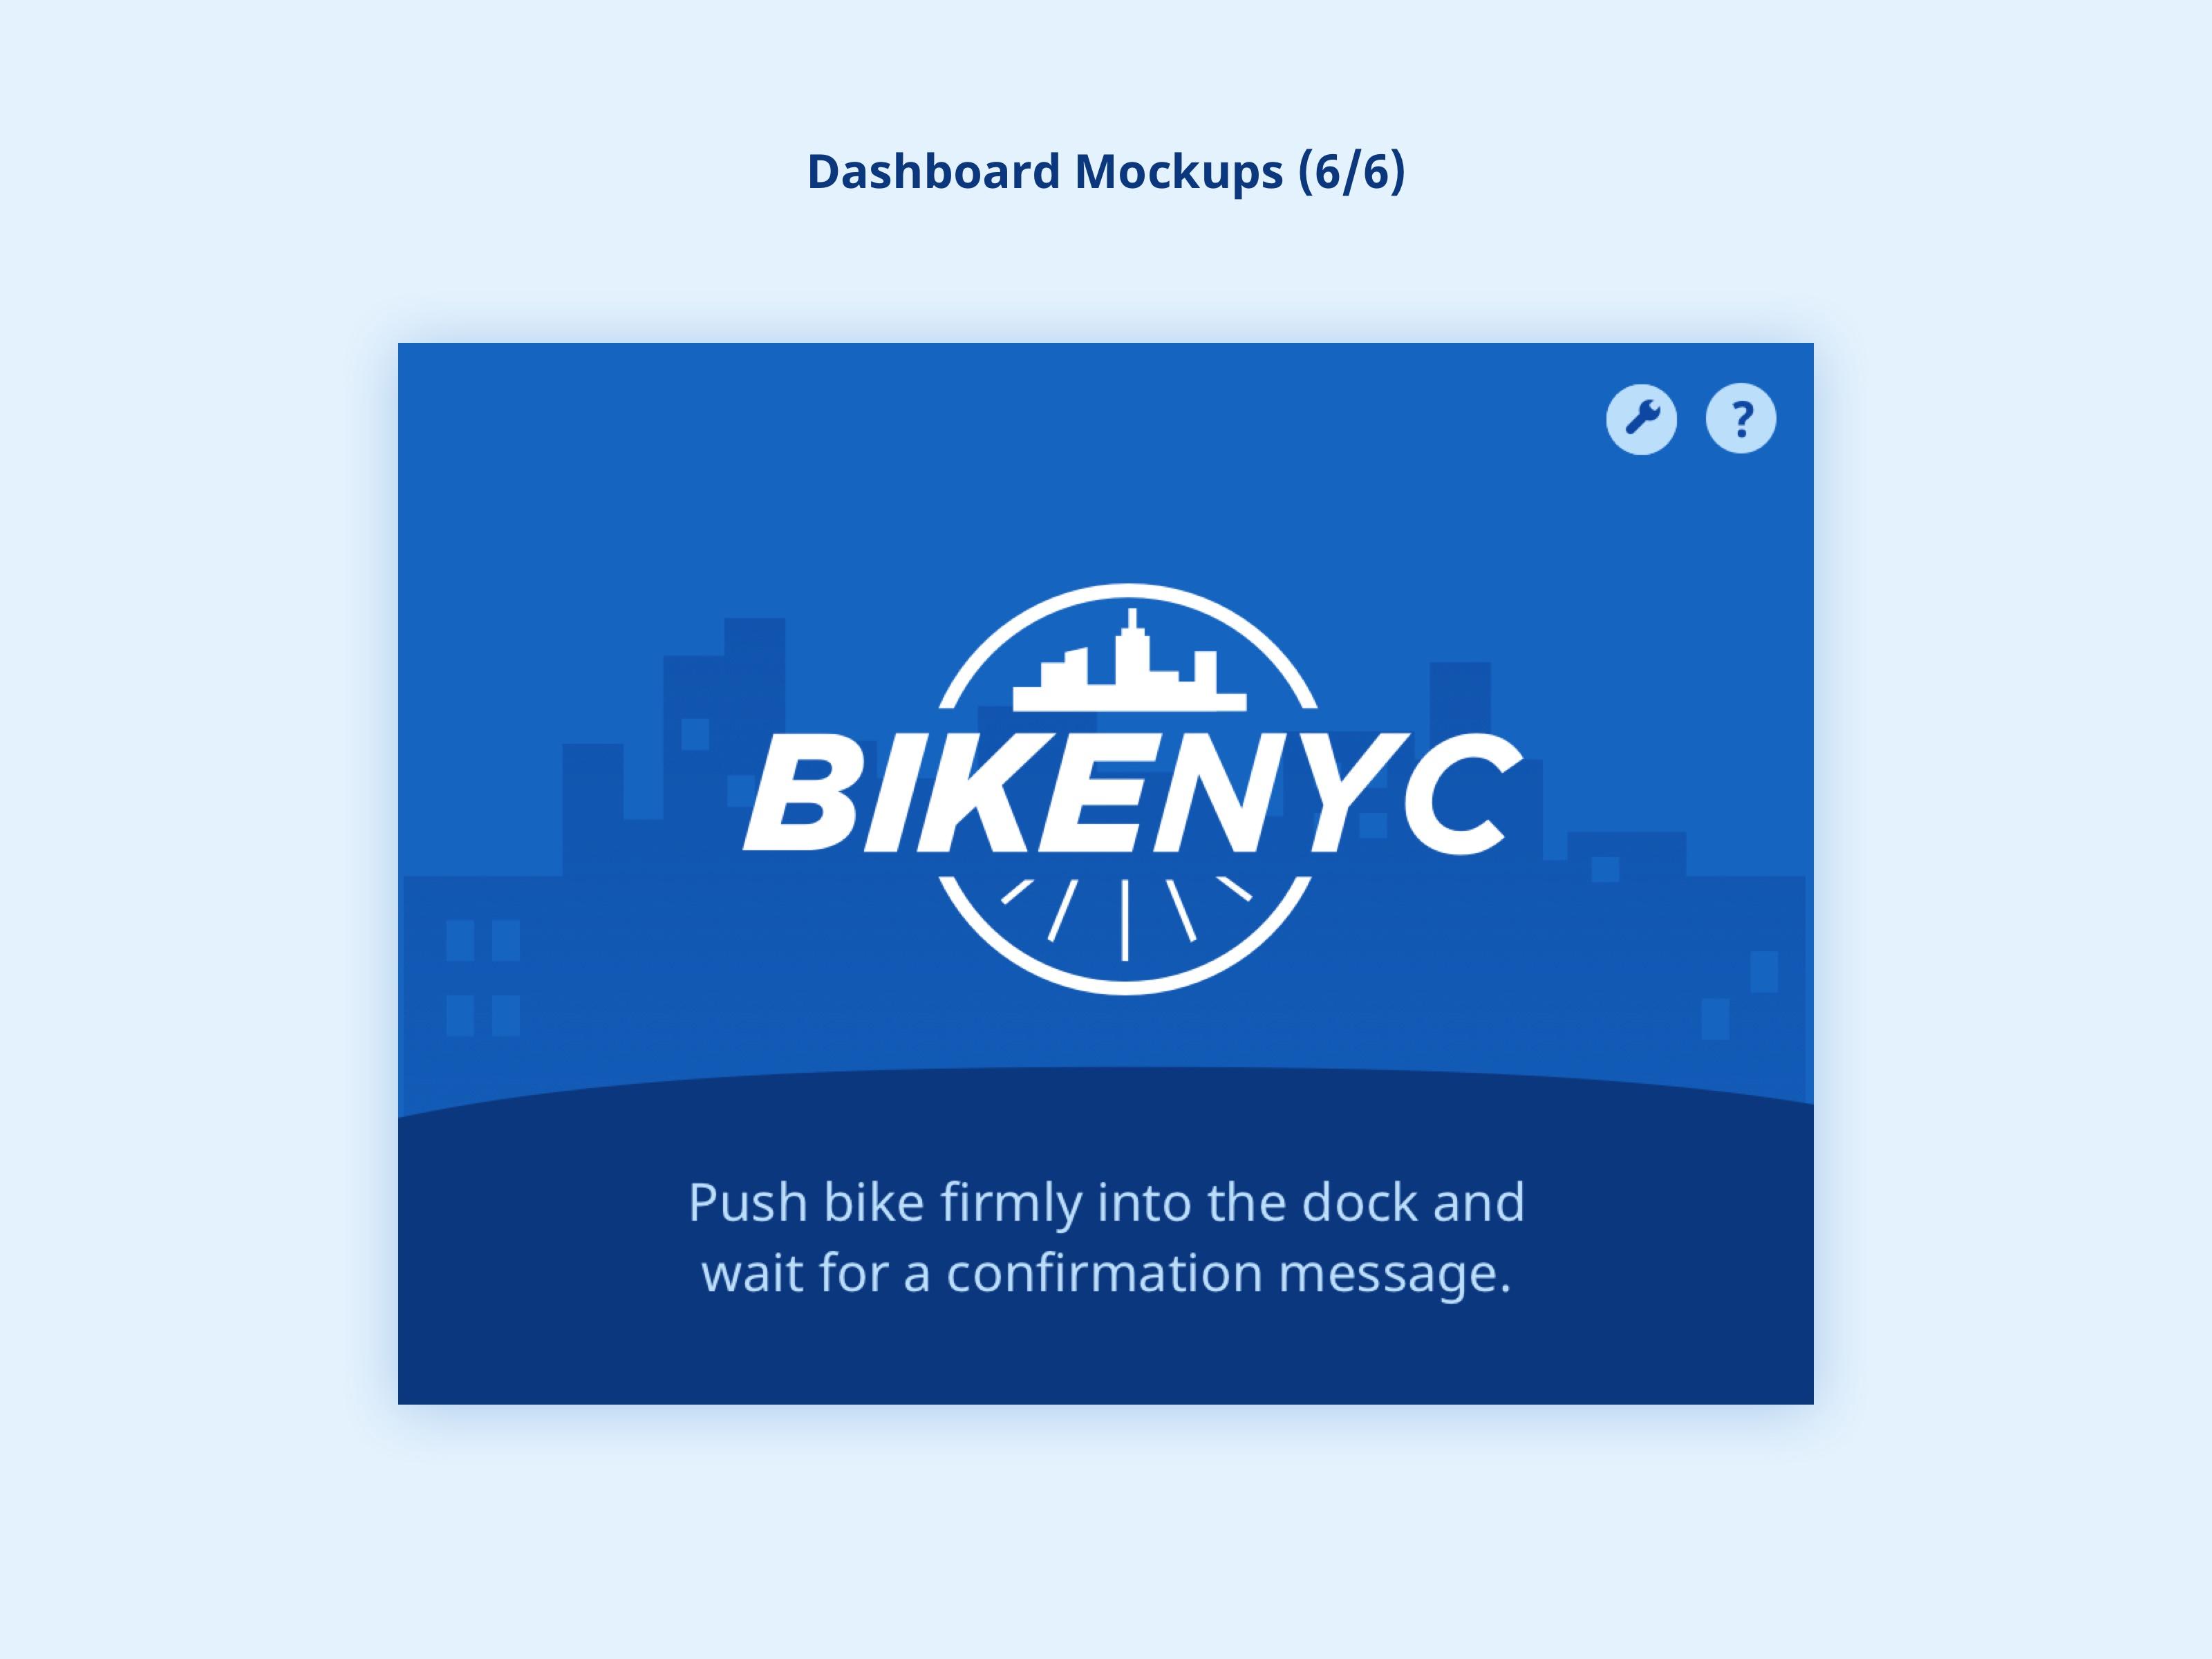 BikeNYC Dashboard - Undocked